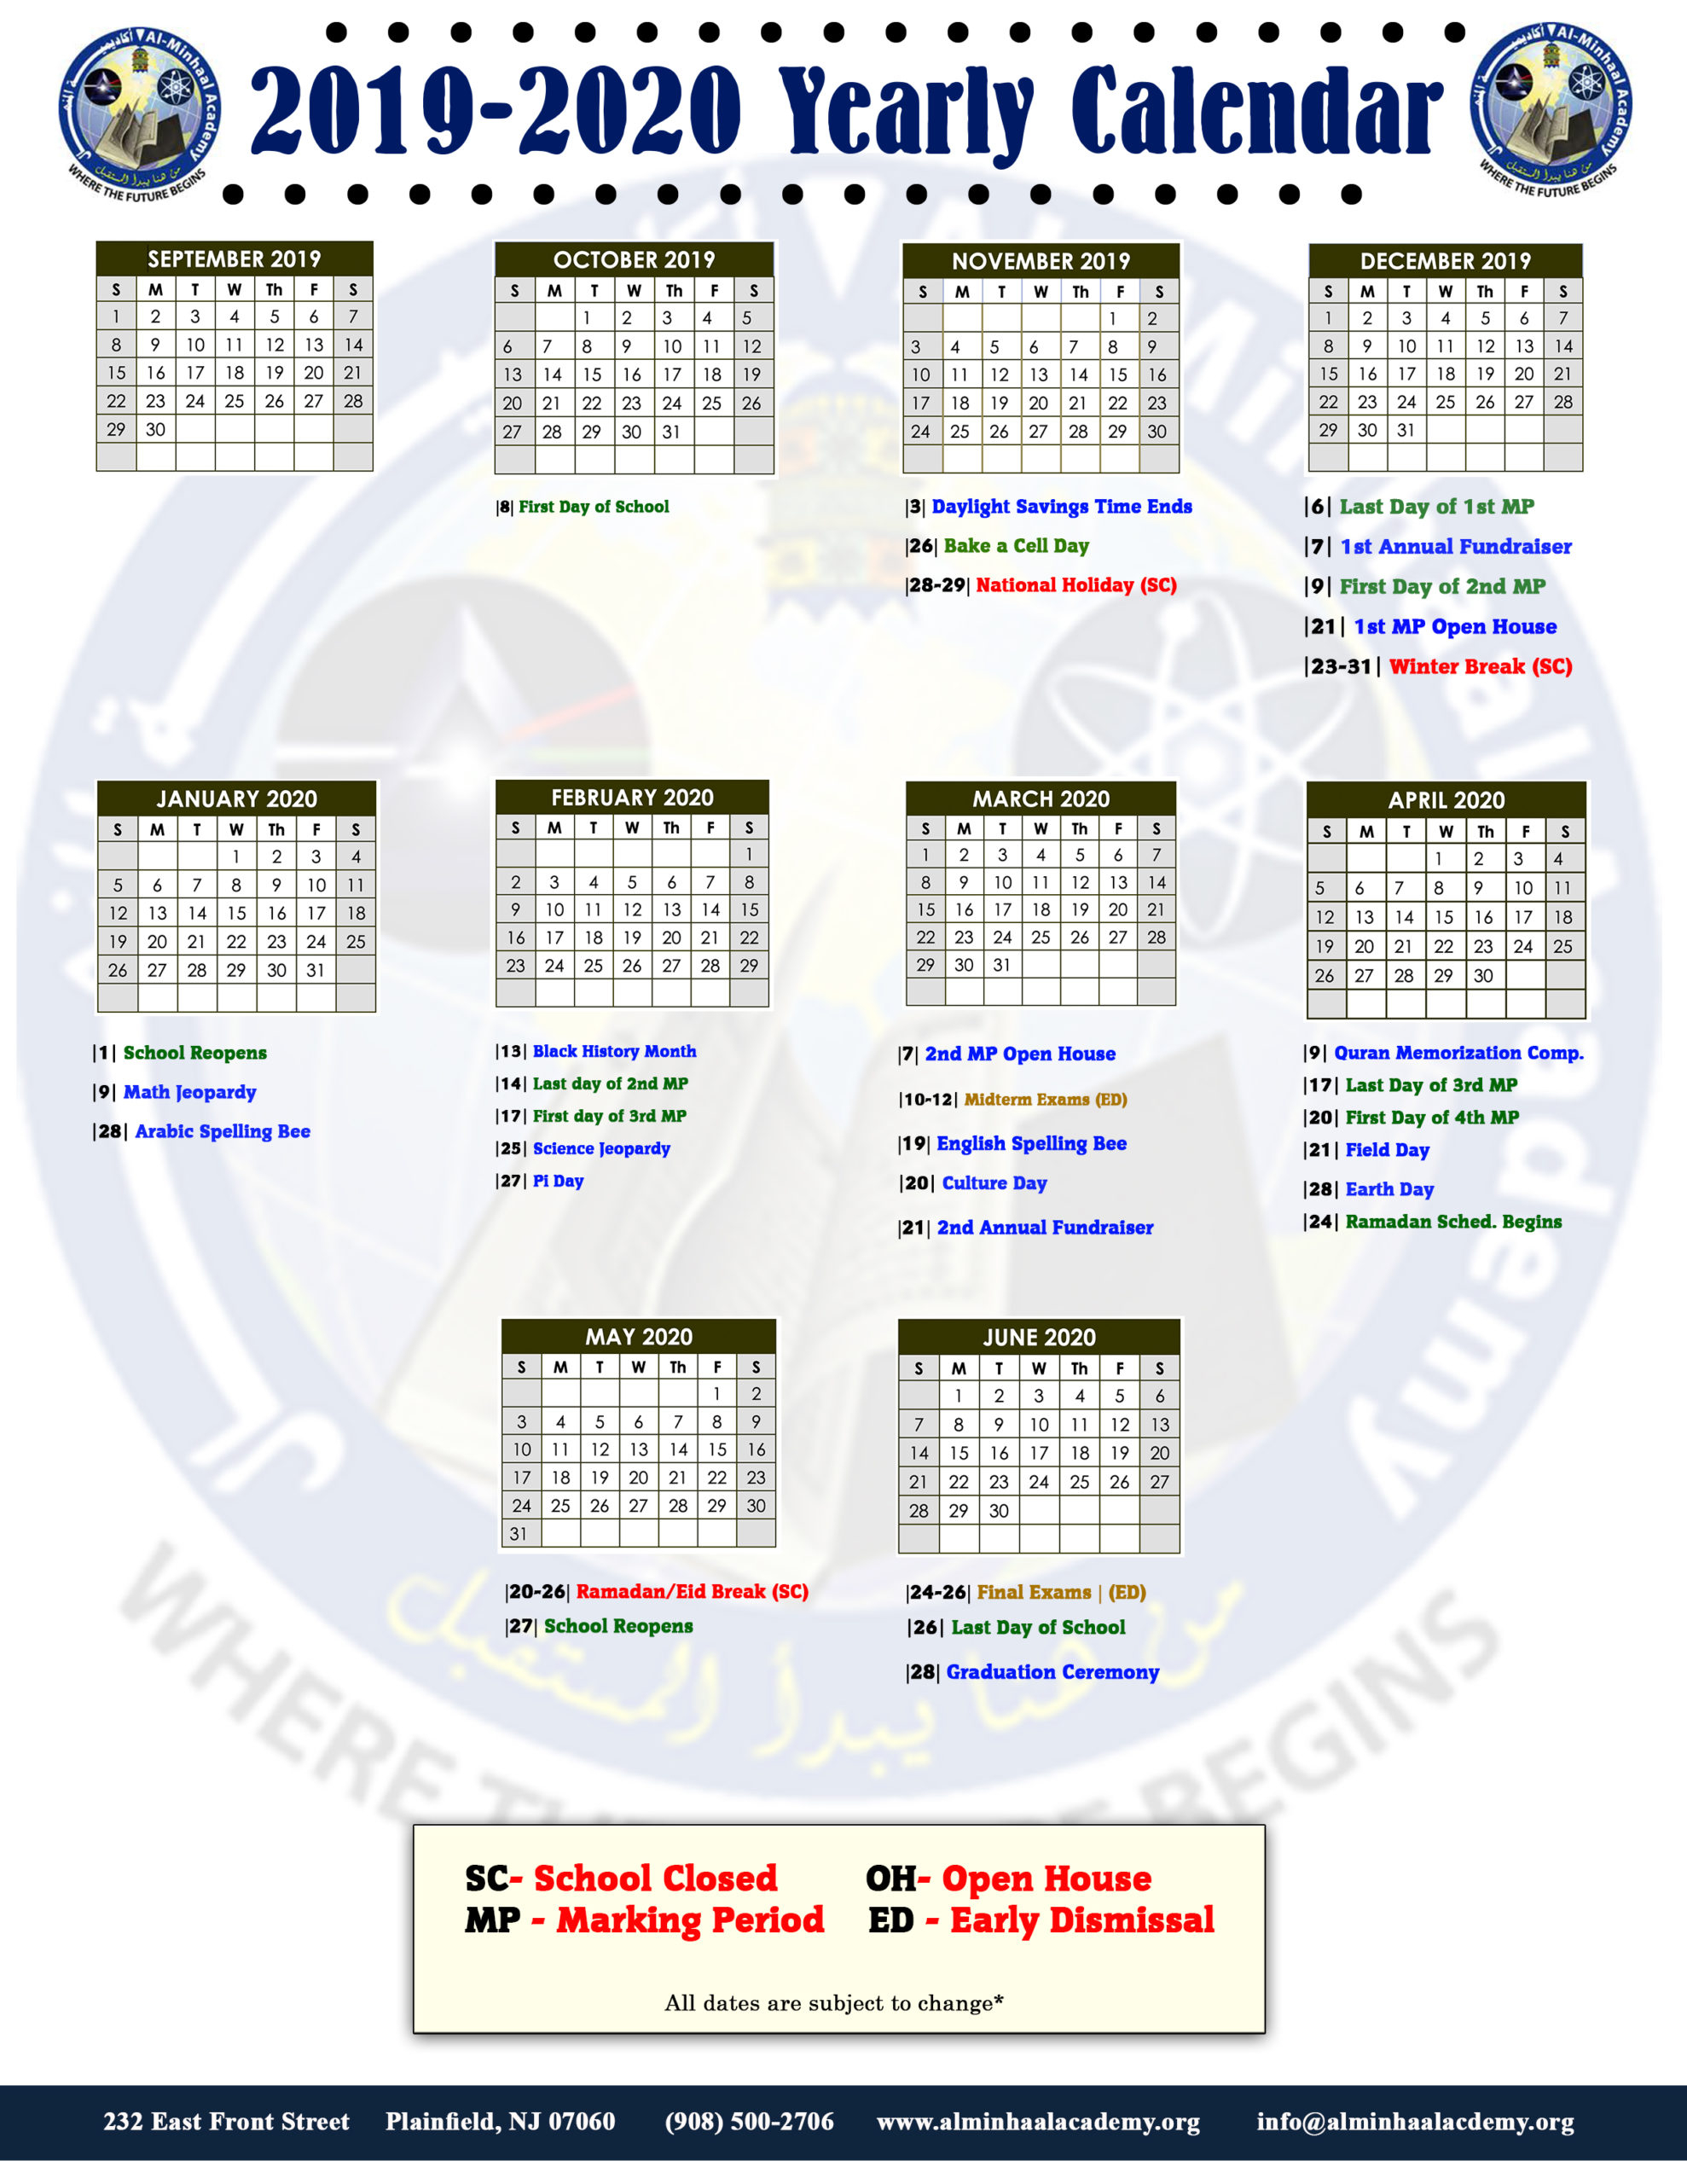 Admissions Calendar | Al Minhaal Academy For Woodbridge Township School Calendar